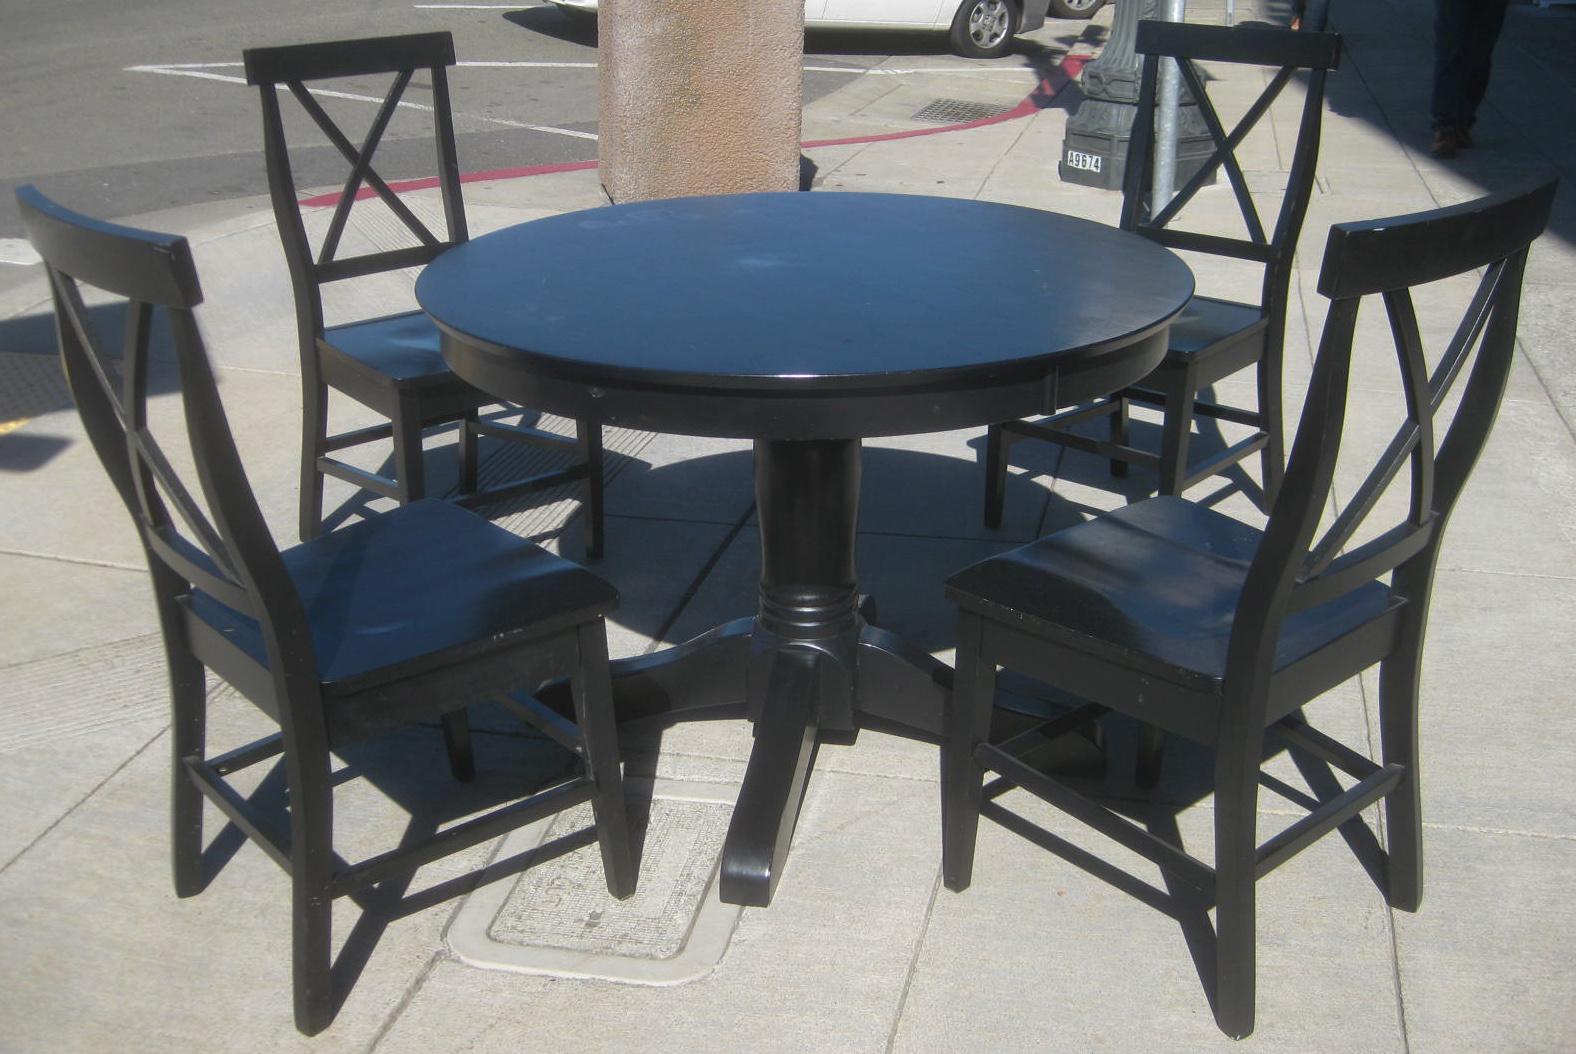 uhuru furniture collectibles sold crate and barrel dining set 225. Black Bedroom Furniture Sets. Home Design Ideas